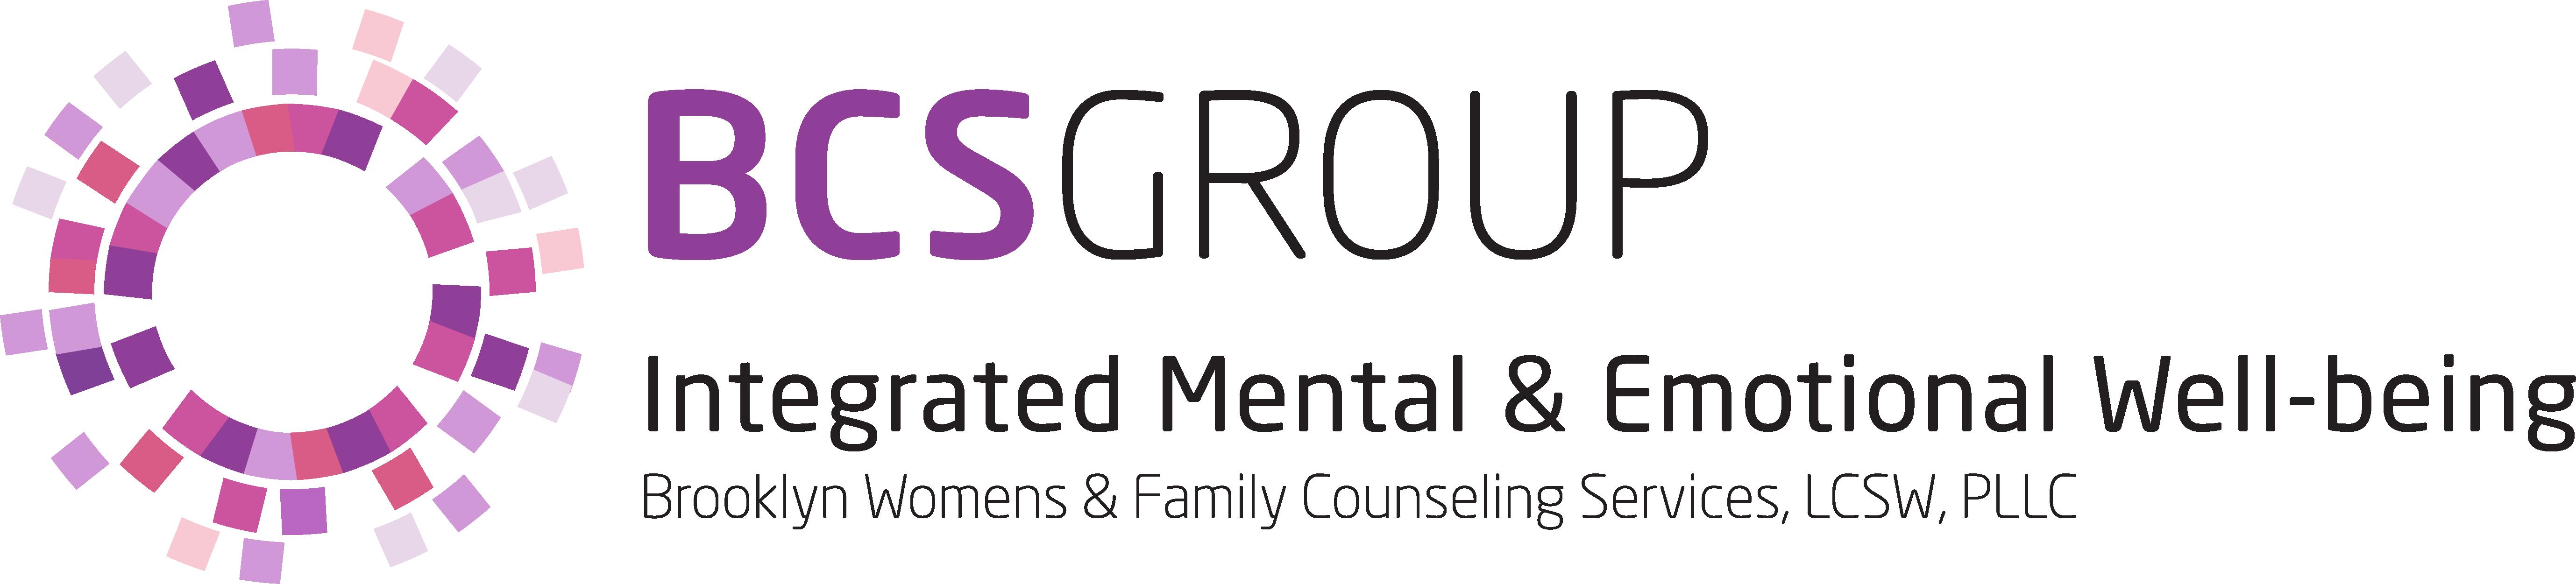 BCS Counseling